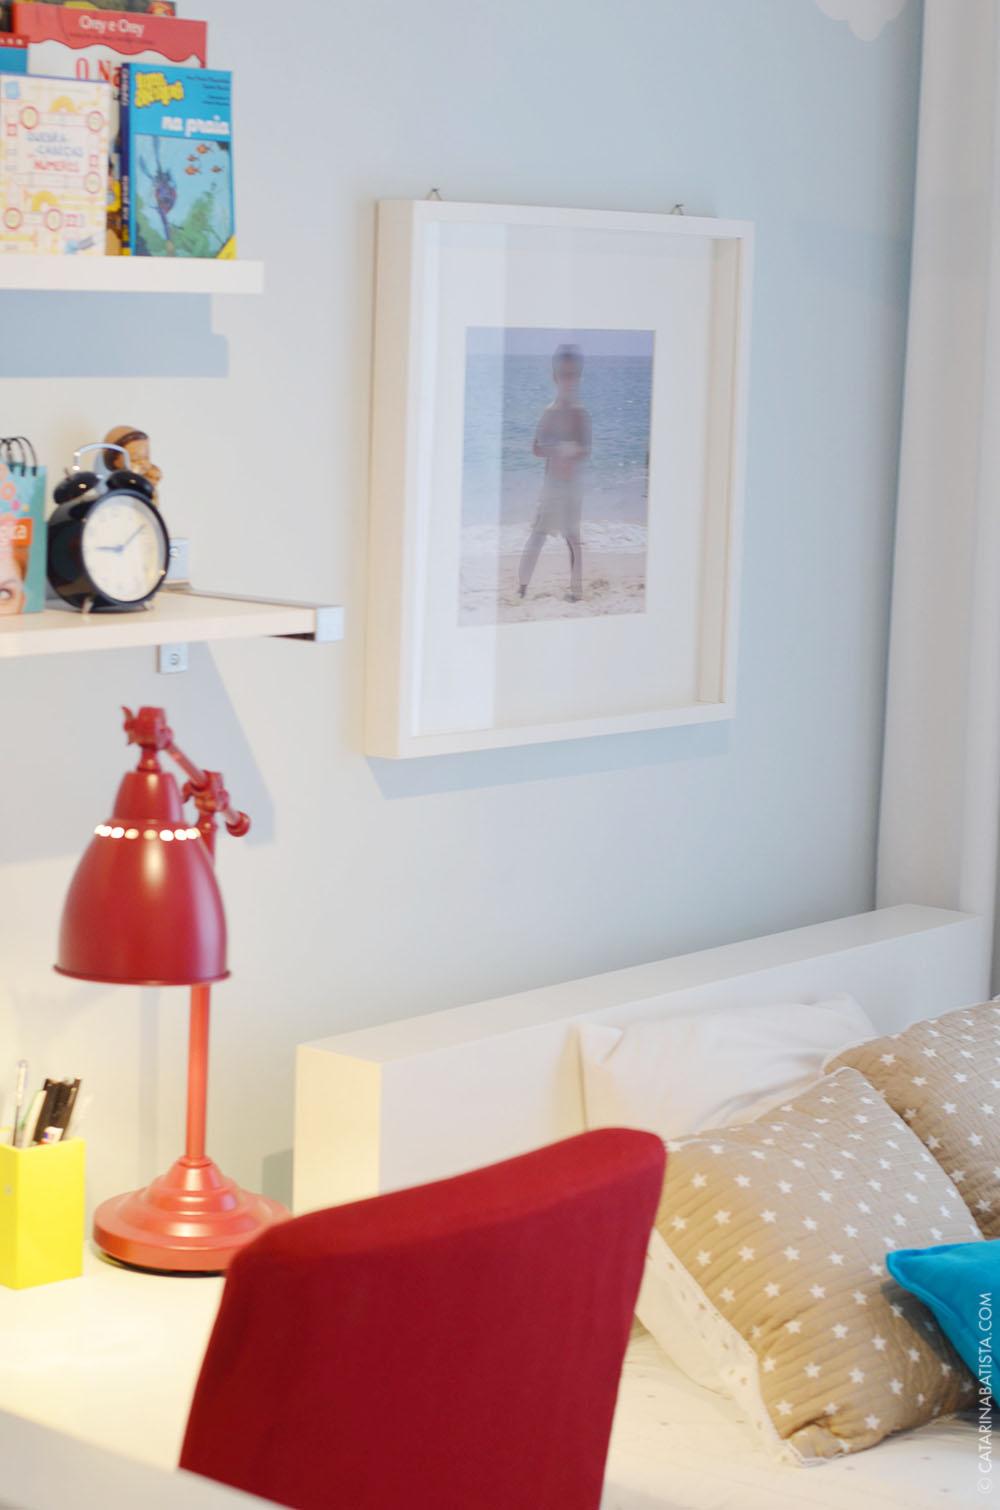 29-catarina-batista-arquitectura-design-interior-decoracao--apartamento-quarto-bedroom-livingroom-sala.jpg